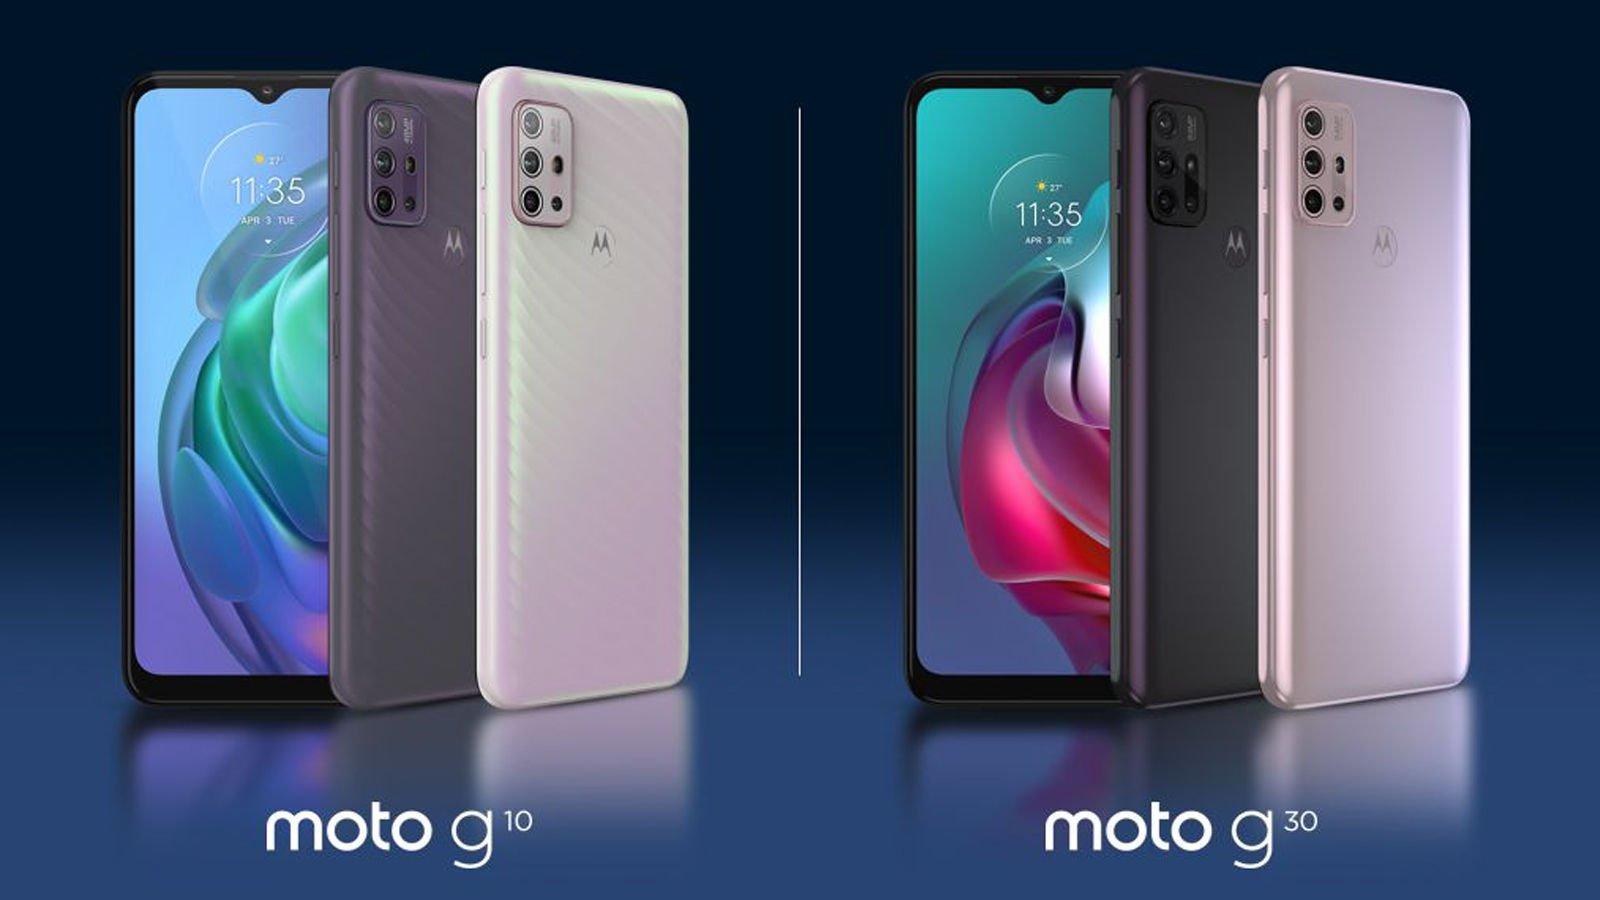 Moto G10 Moto G30 product press image